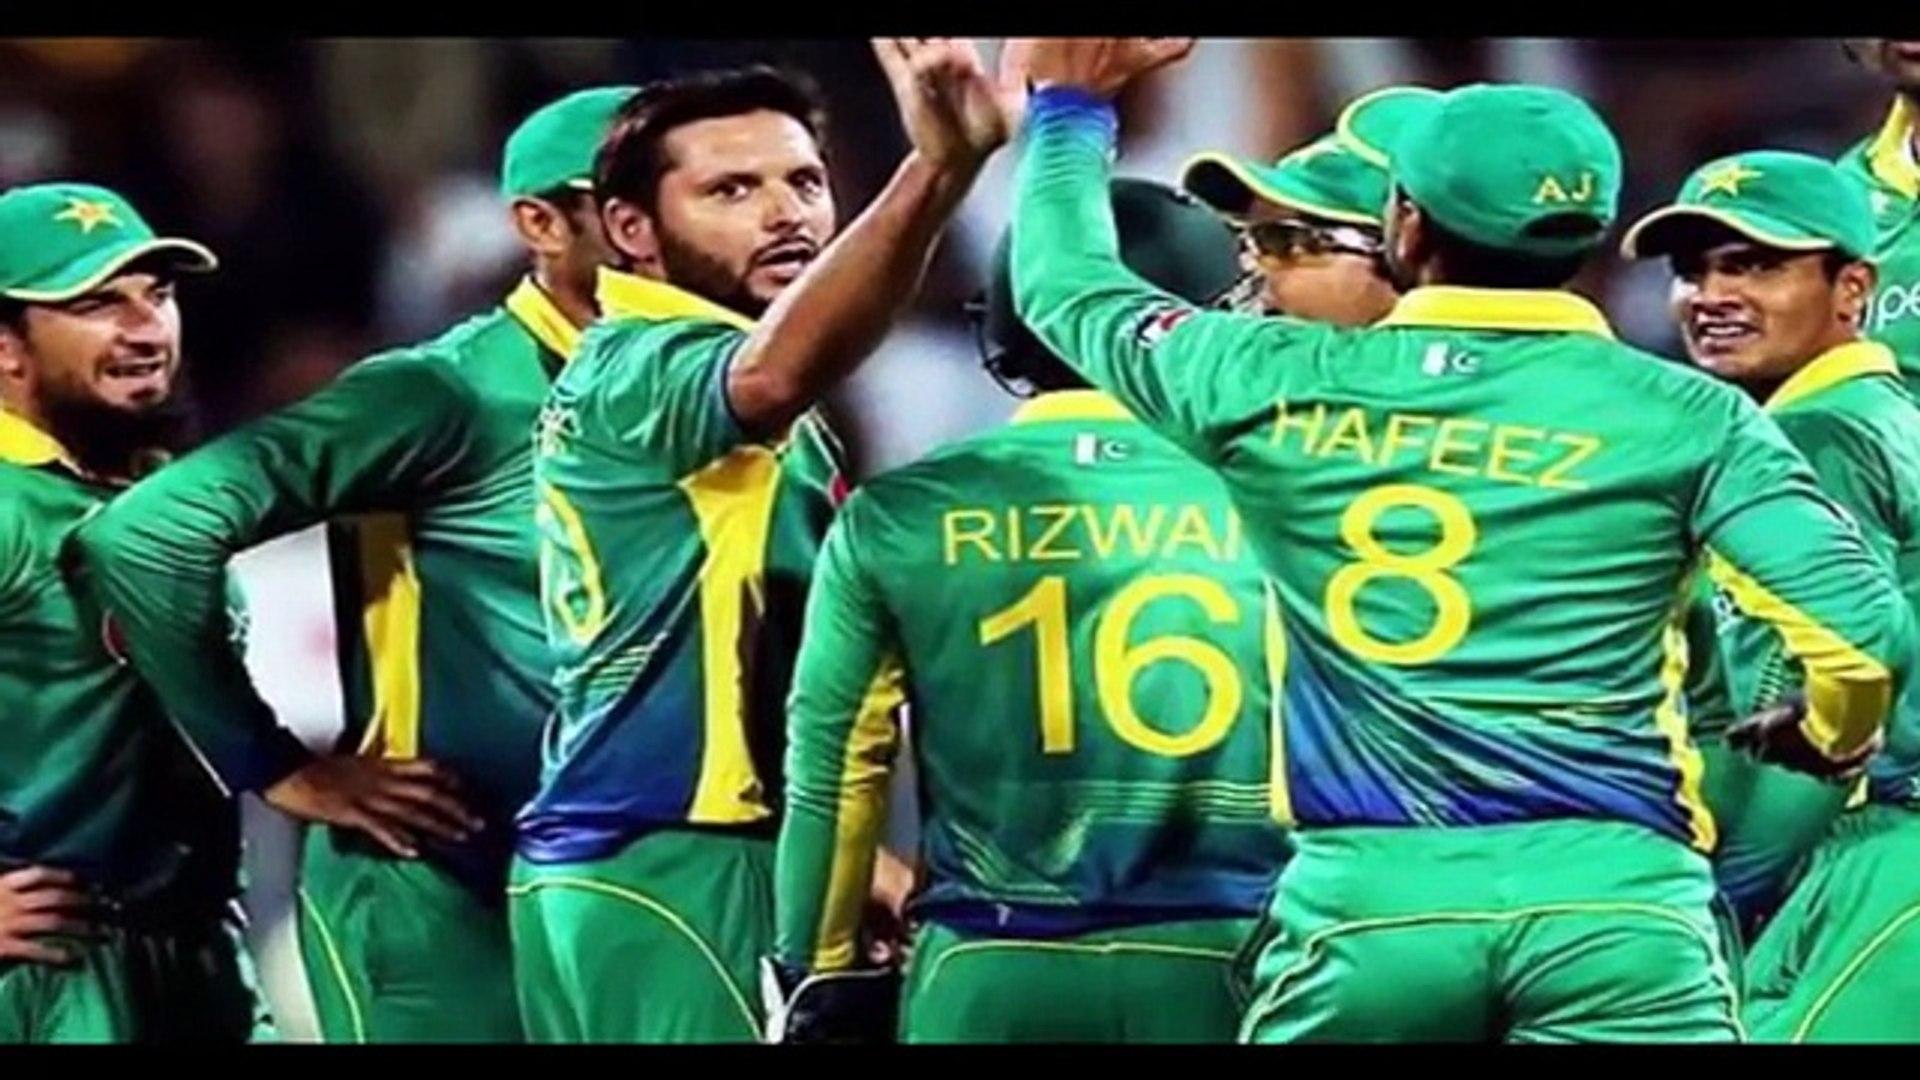 Rishi Kapoor ka pak vs india final match pr aisa bayan k pora pakistan bhrk utha. - YouTube